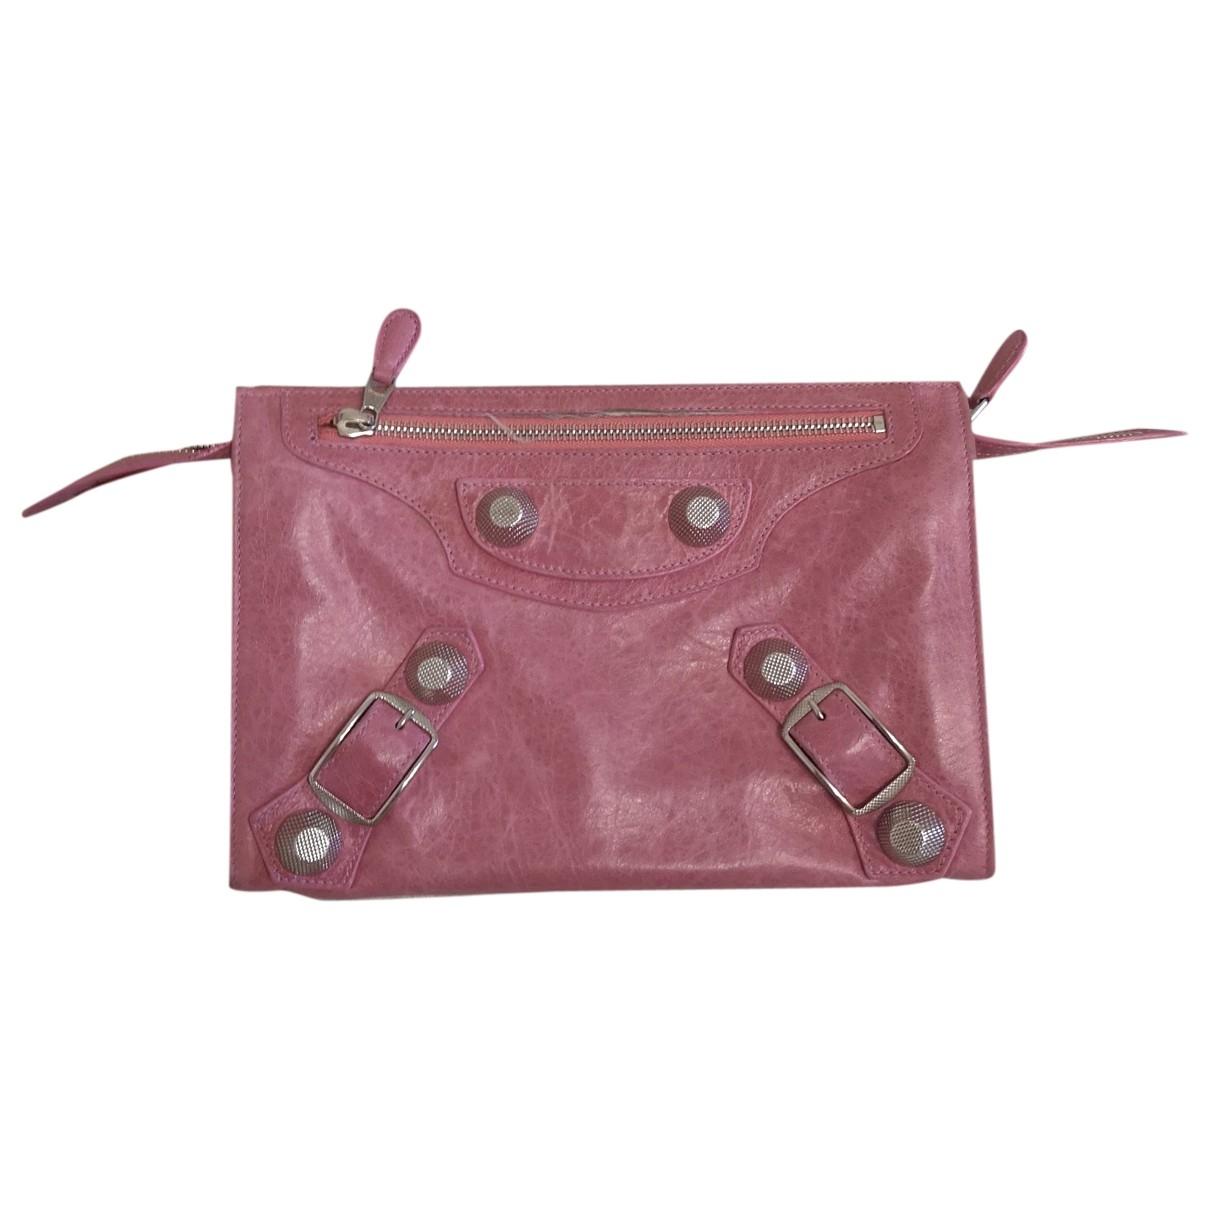 Balenciaga City Pink Leather Clutch bag for Women \N